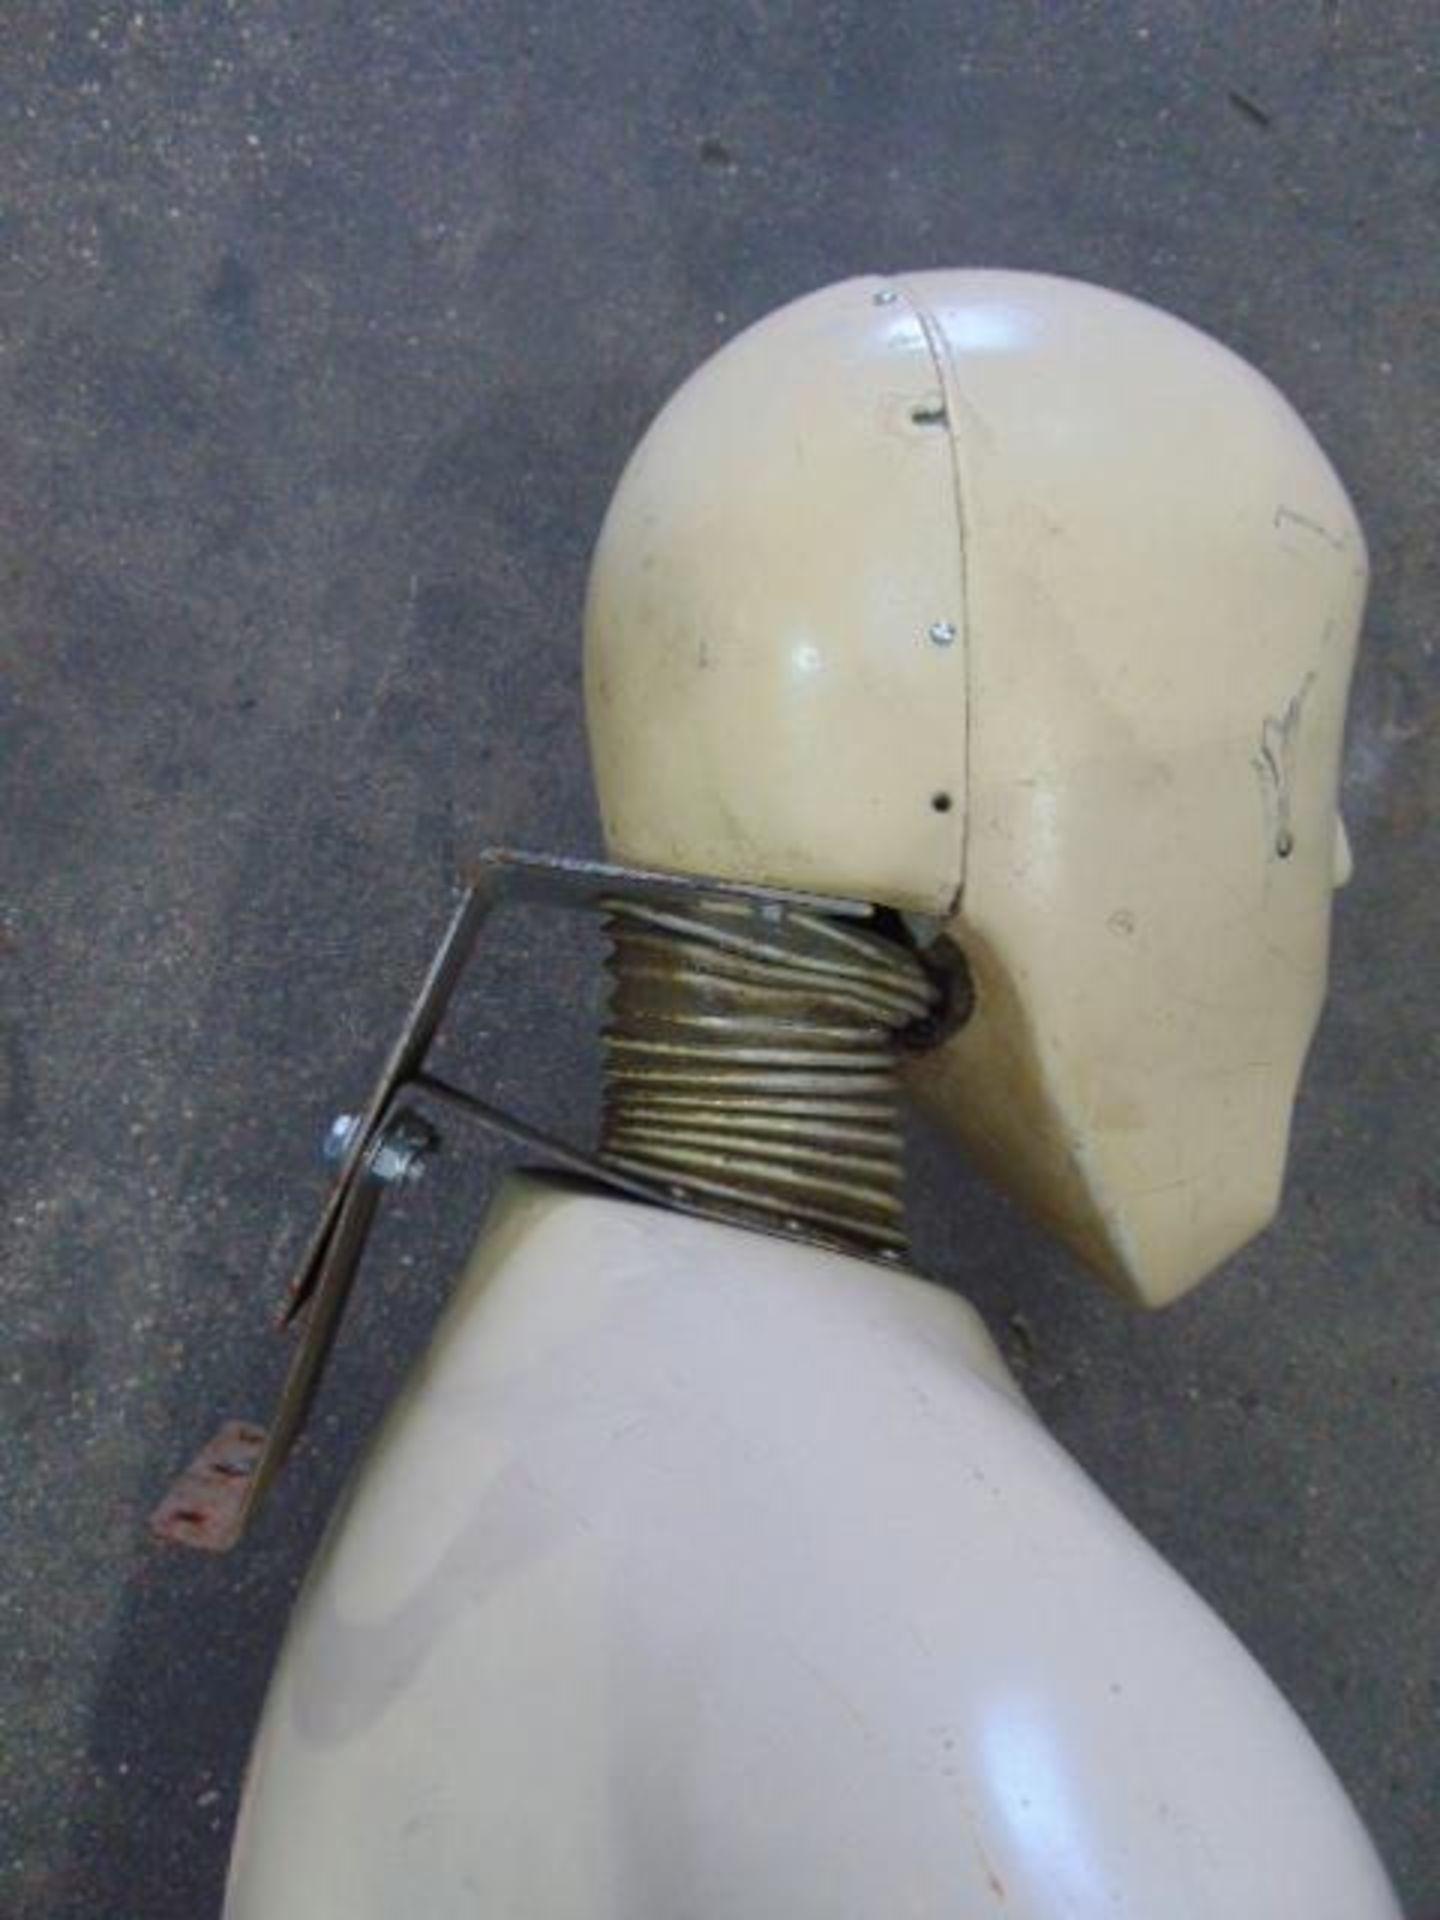 Lotto 26403 - Vintage Crash Test and Training Dummy